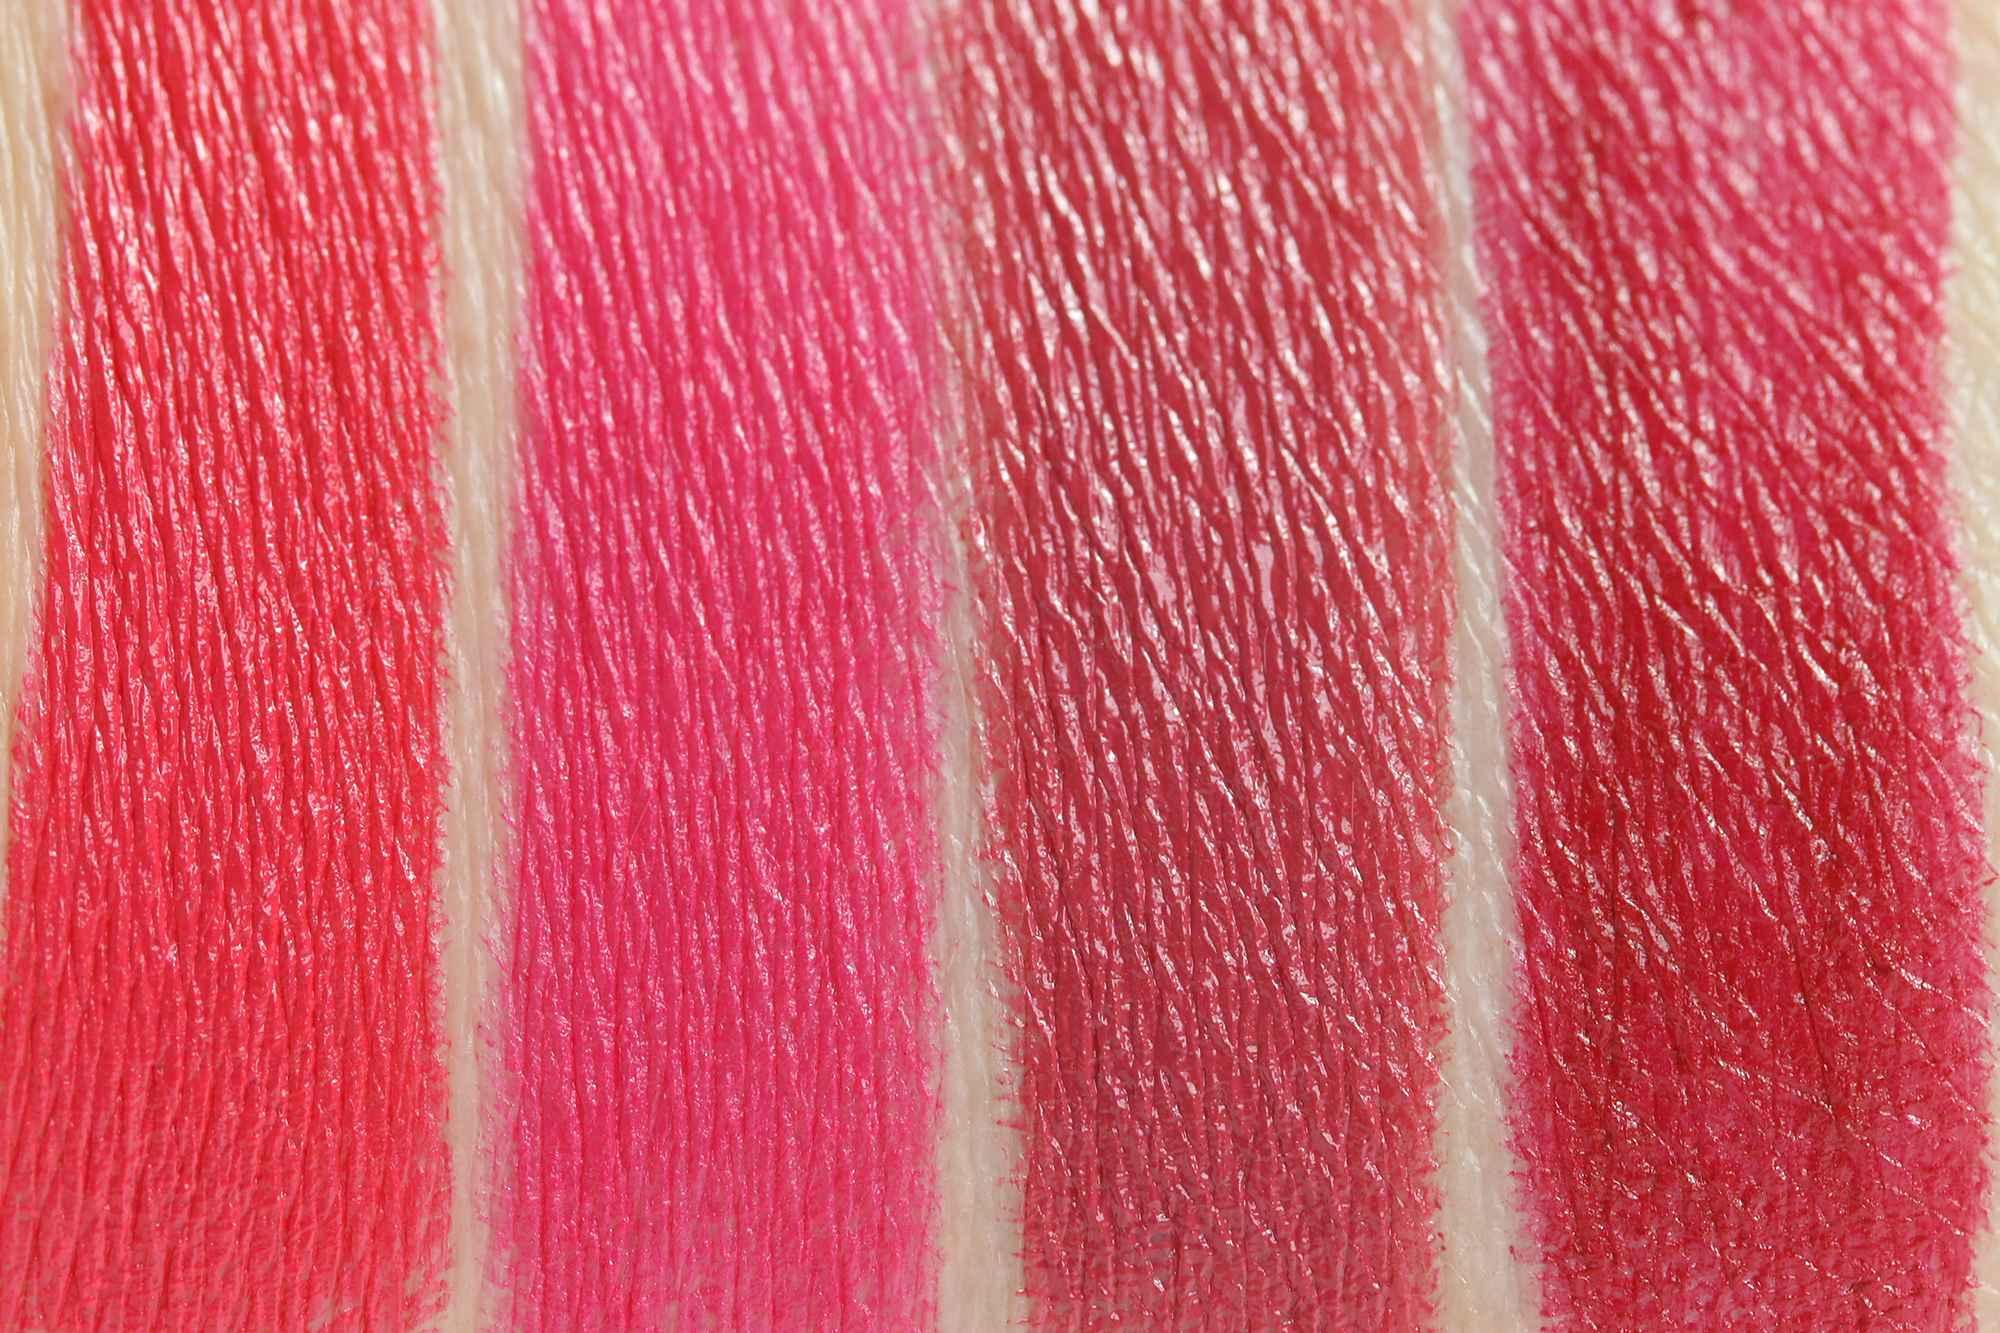 LIPaffair Color & Care Lippenstift Swatches InnenAussen 2